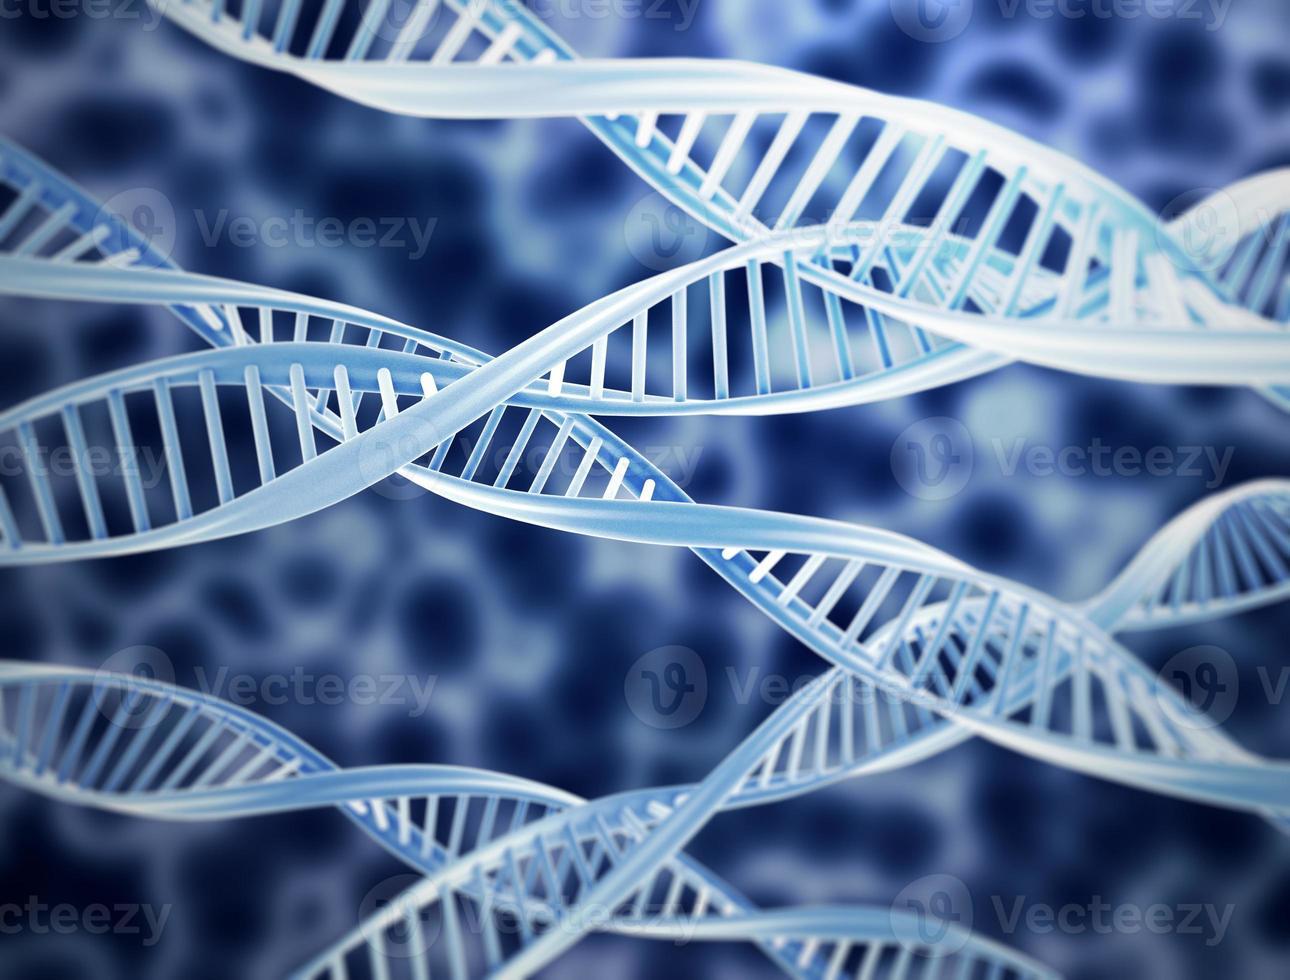 ADN photo